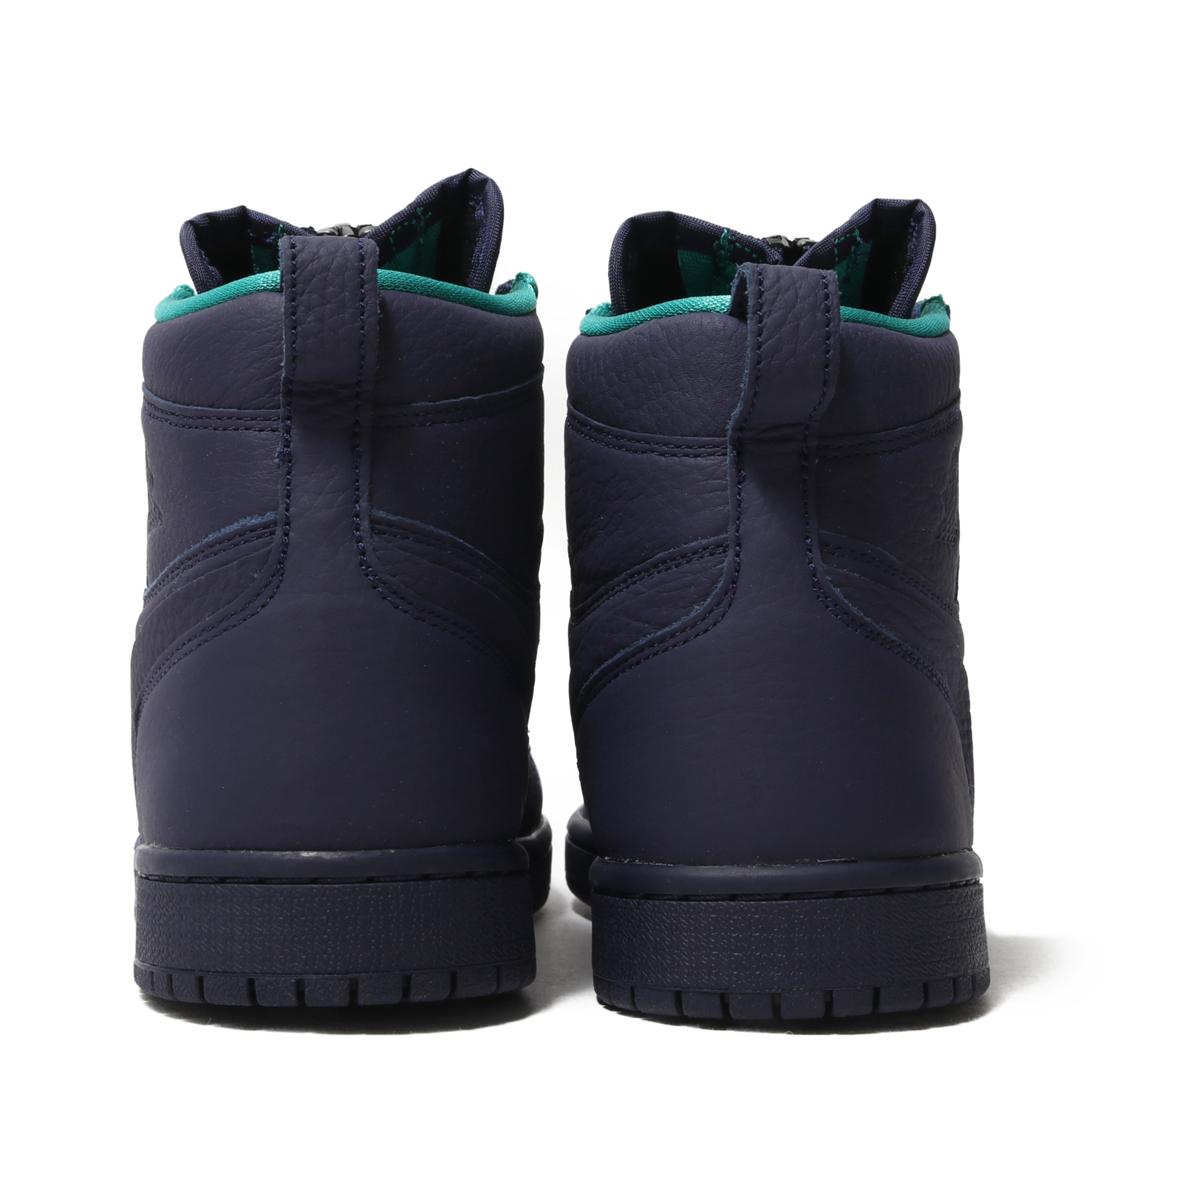 fa89a3d59343 NIKE WMNS AIR JORDAN 1 HIGH ZIP (BLACKENED BLUE NEPTUNE GREEN-WHITE) (Nike  women Air Jordan 1 high zip)